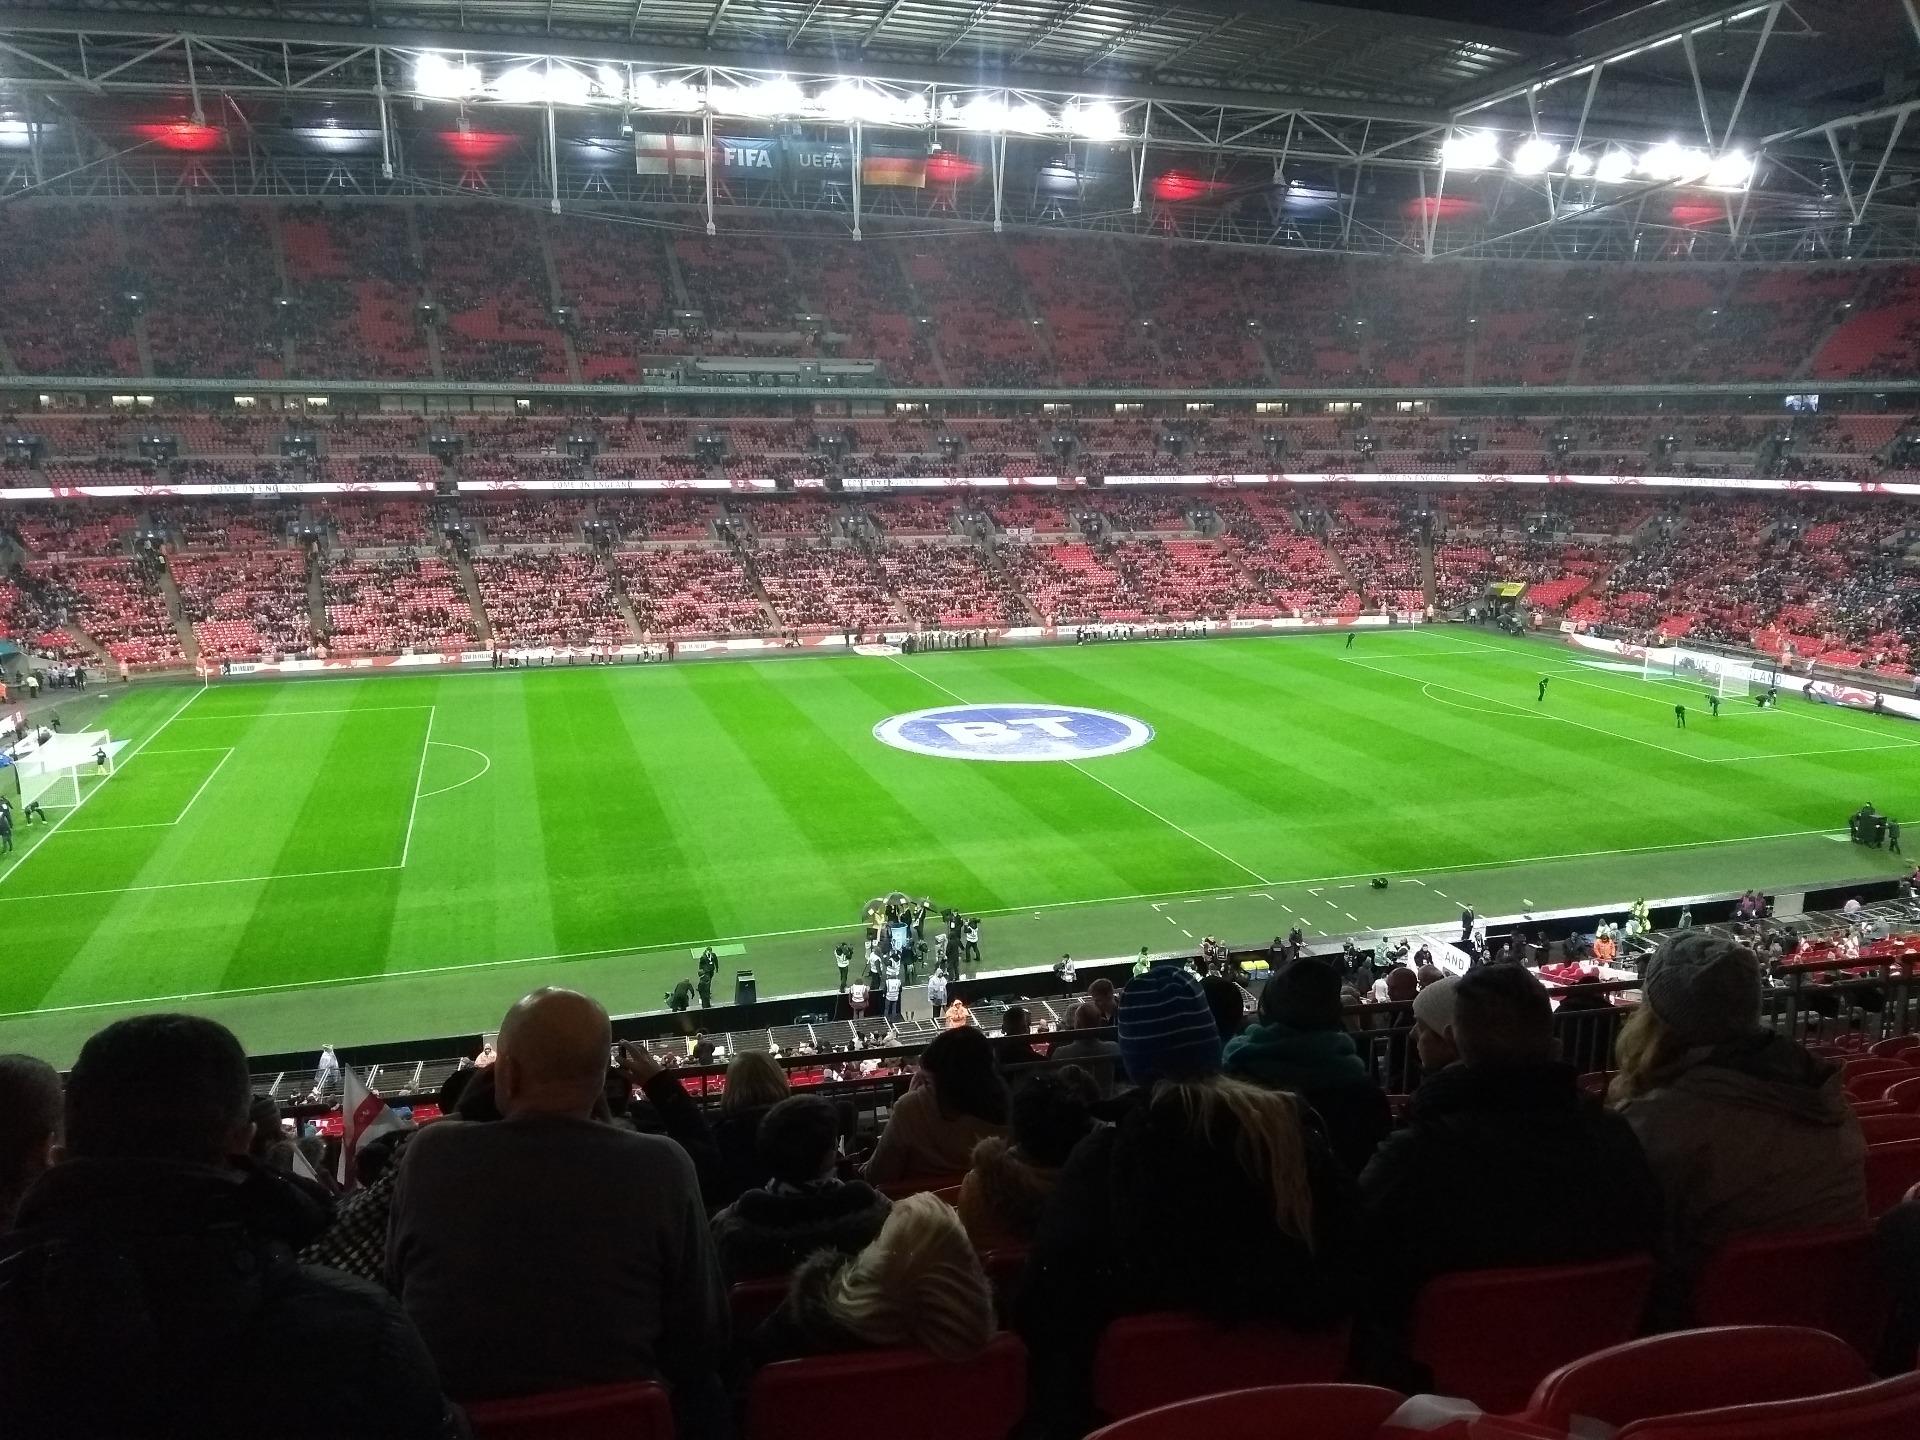 Wembley Stadium Section 203 Row 15 Seat 36